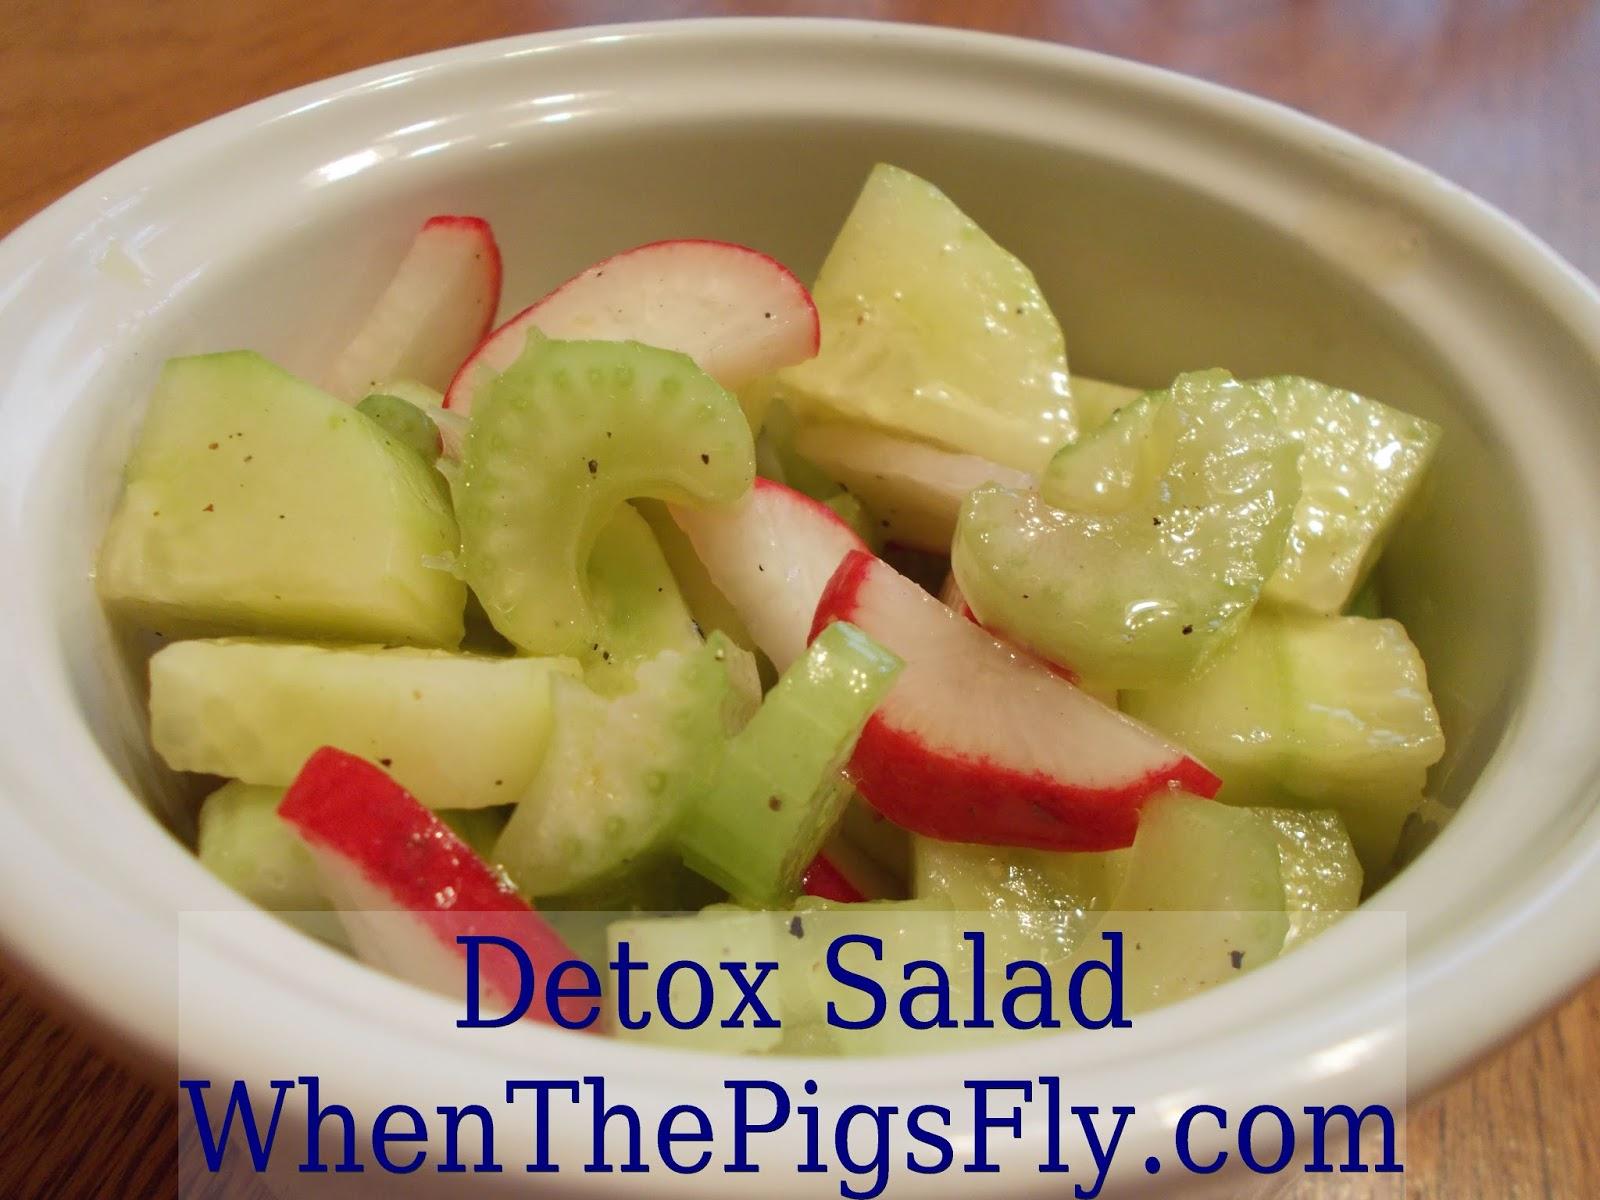 detox+salad.jpg